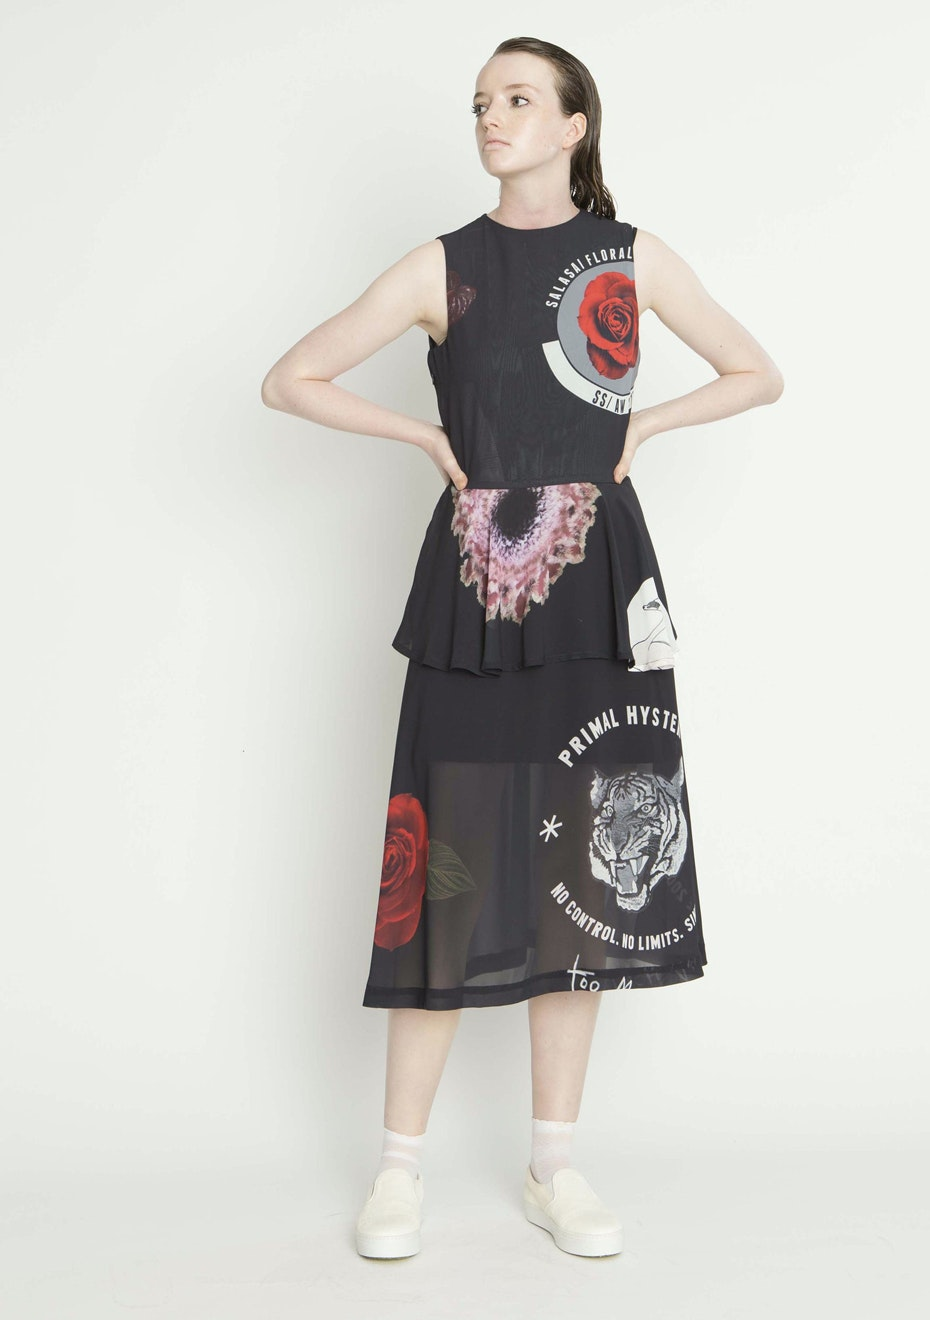 Salasai - WORLD OF MAYHEM DRESS - STICKER PRINT